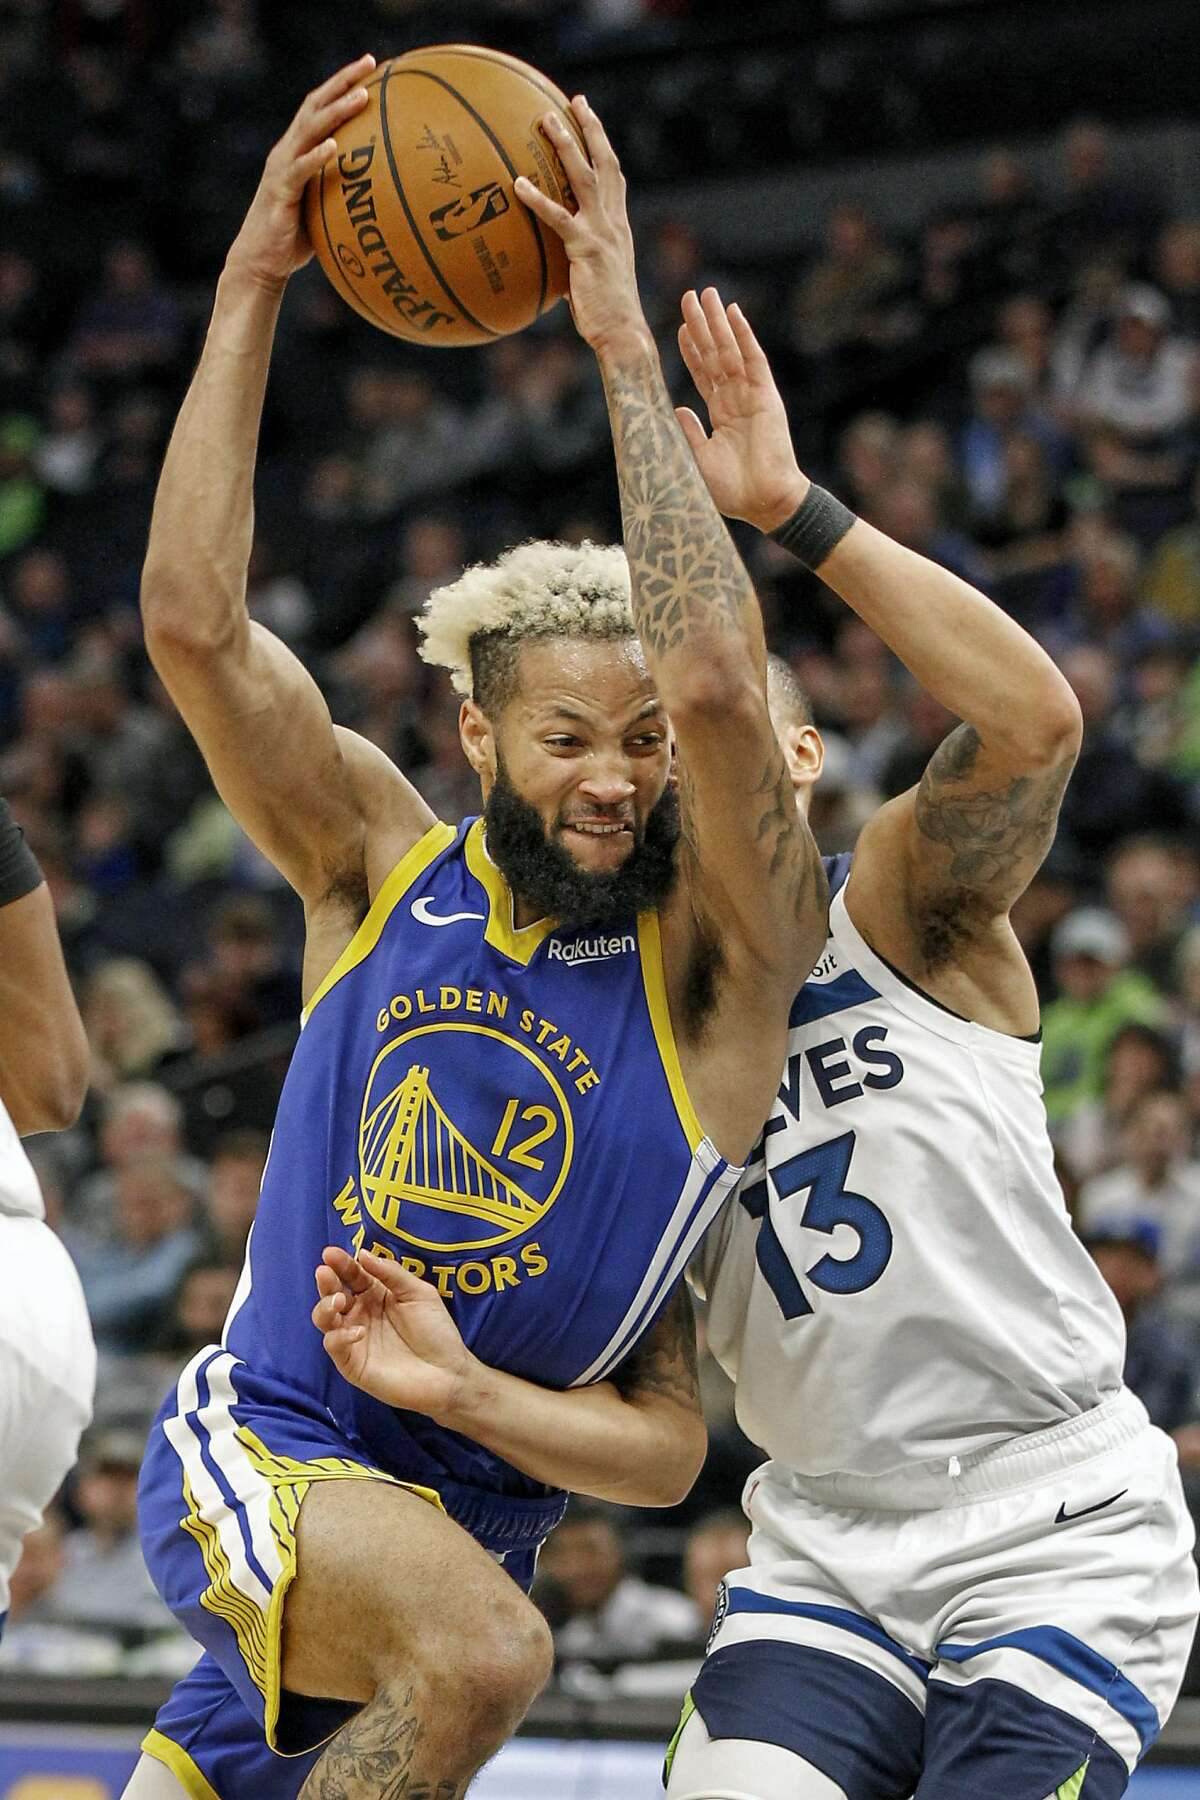 Golden State Warriors guard Ky Bowman (12) drives past Minnesota Timberwolves guard Shabazz Napier (13) in the second half of an NBA basketball game Thursday, Jan. 2, 2020, in Minneapolis. The Timberwolves won 99-84. (AP Photo/Bruce Kluckhohn)